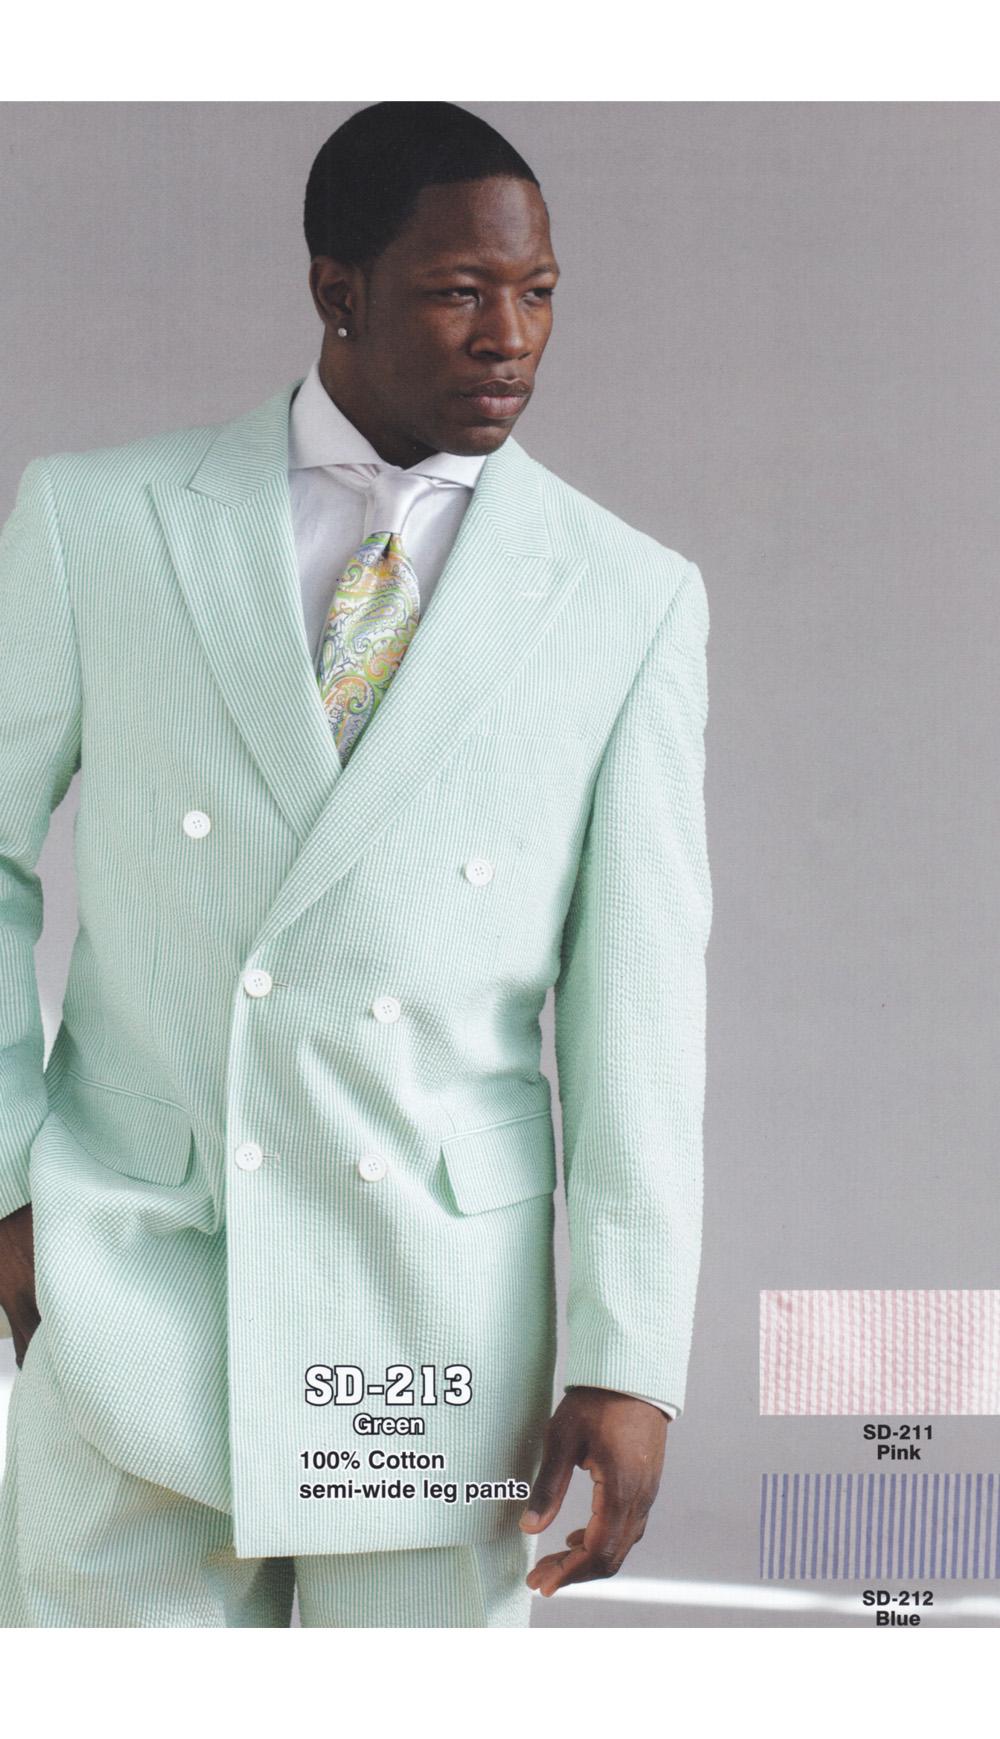 High Fashion Men Suits SD-213